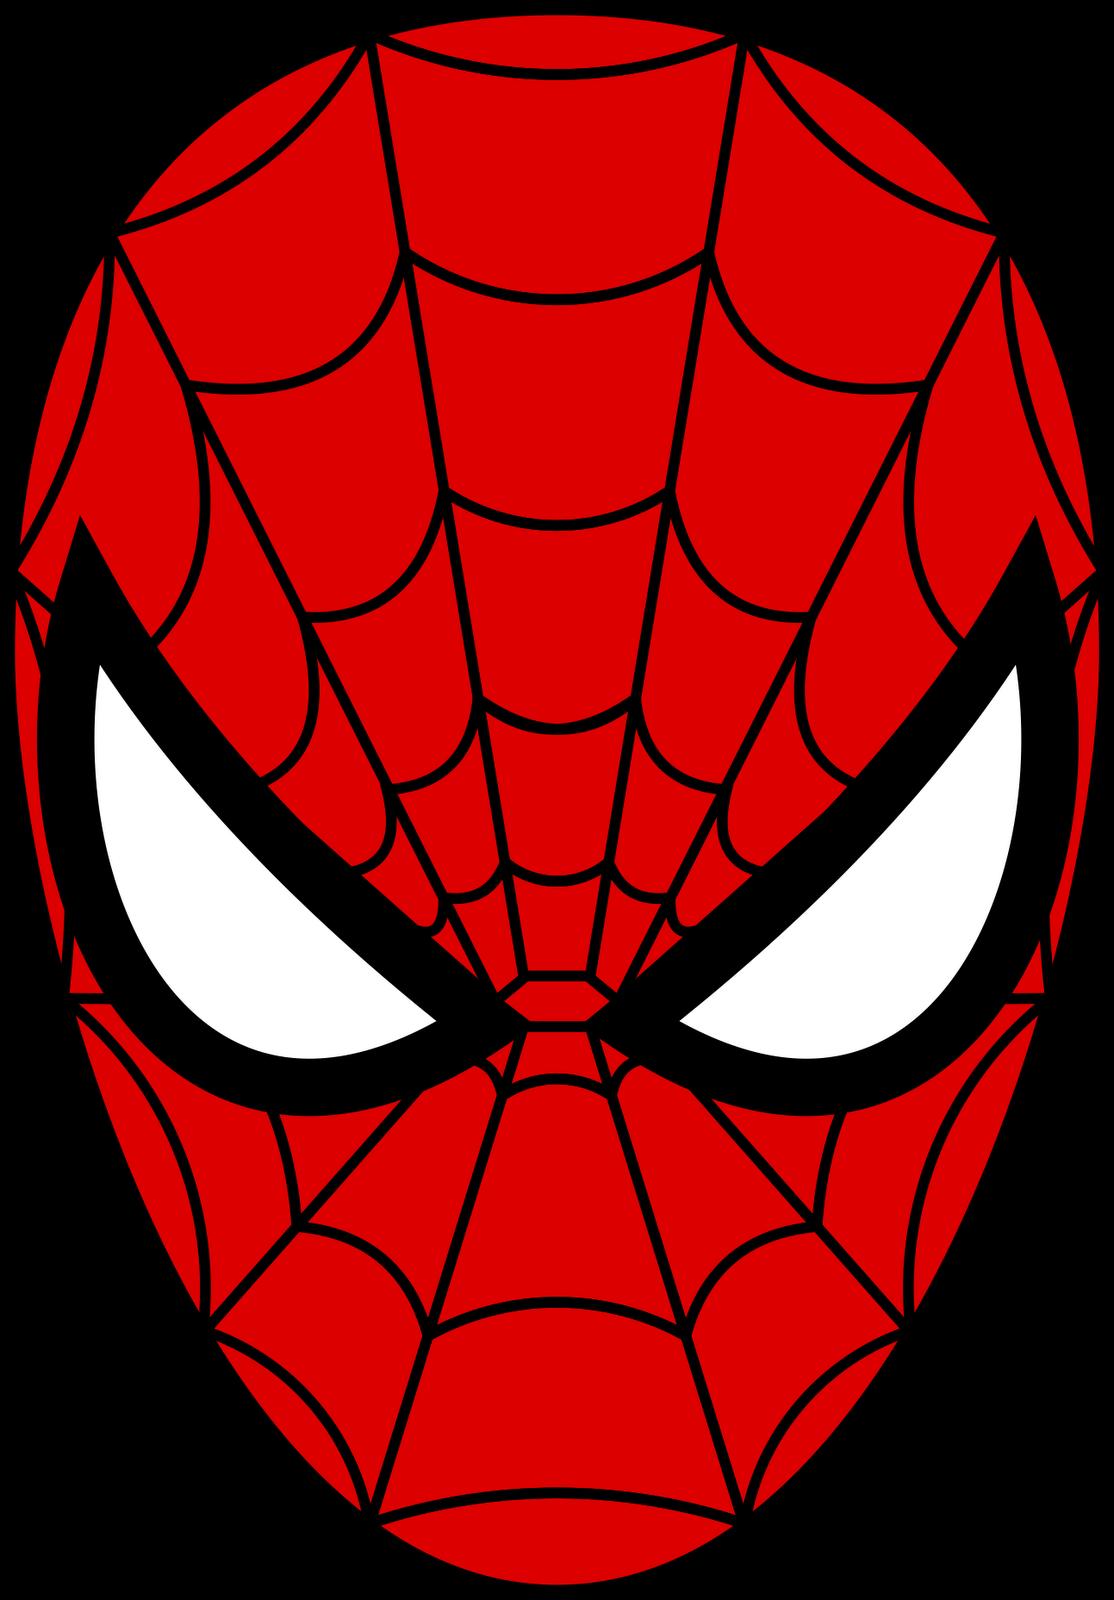 The Amazing Spider-Man (free download vector) ~ DENIZIGNKO